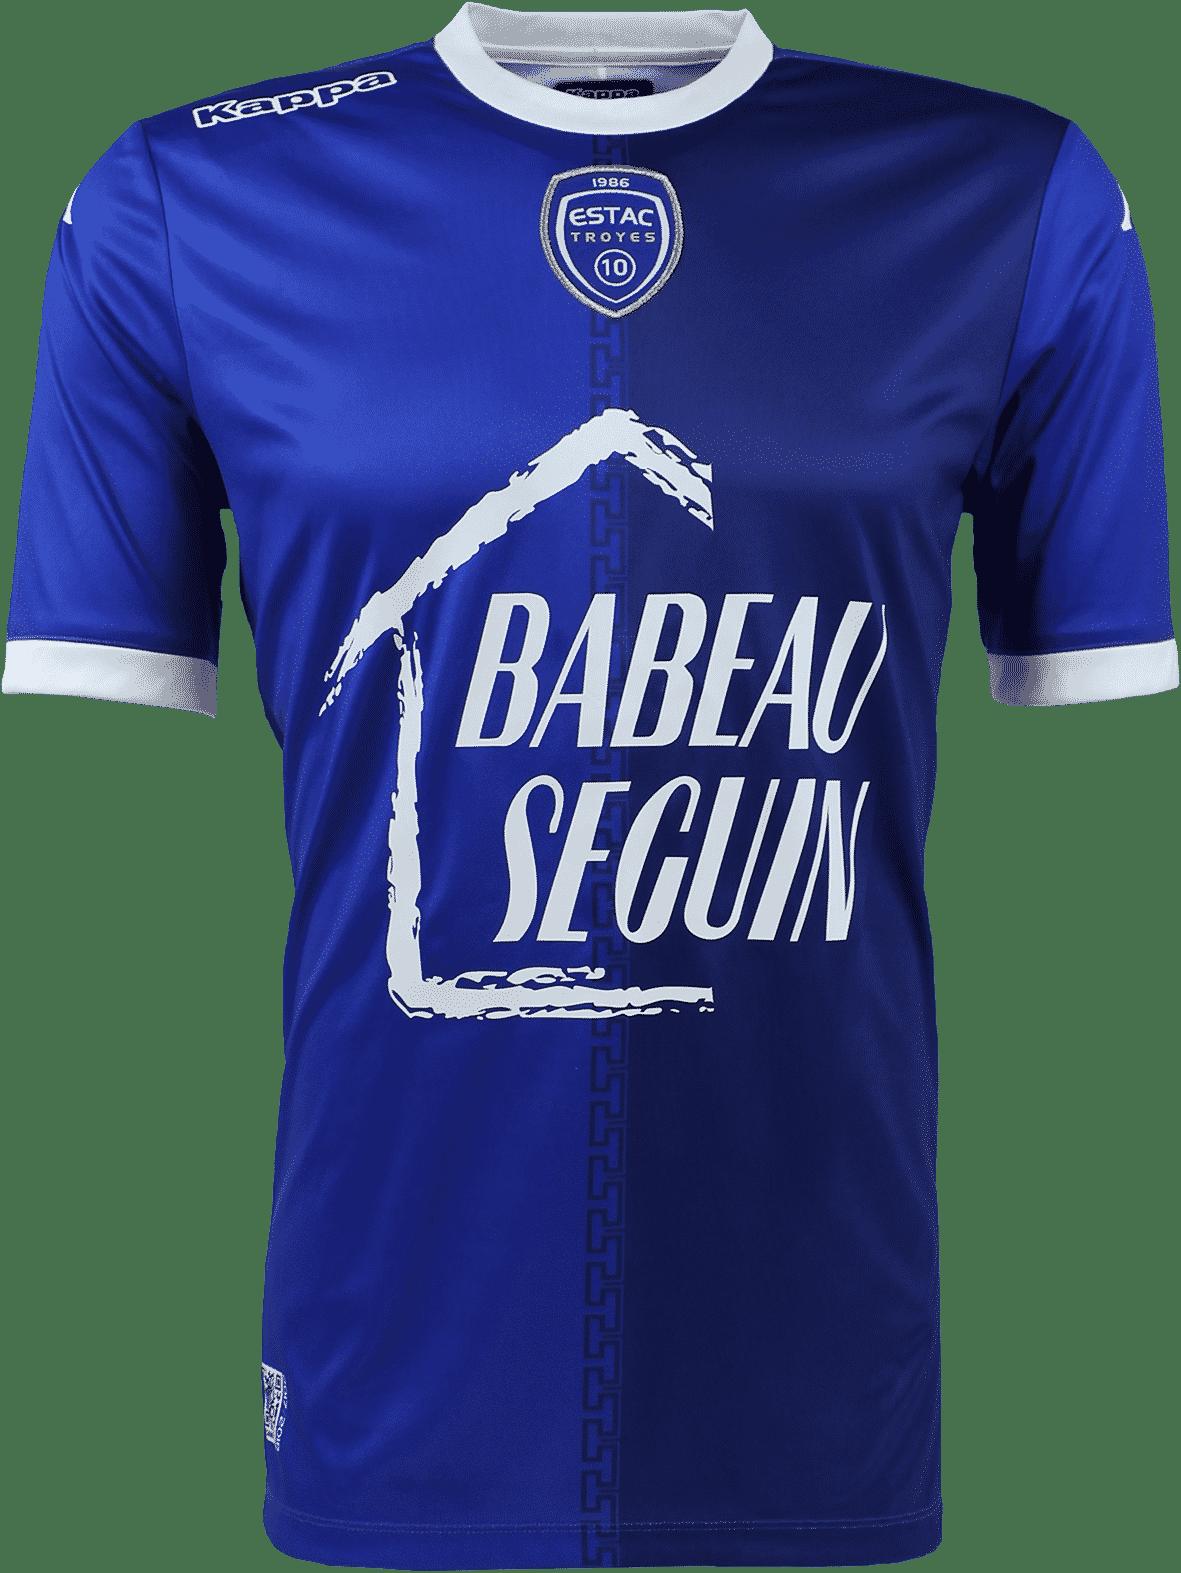 tous les maillots de foot kappa de la saison 2017 2018. Black Bedroom Furniture Sets. Home Design Ideas